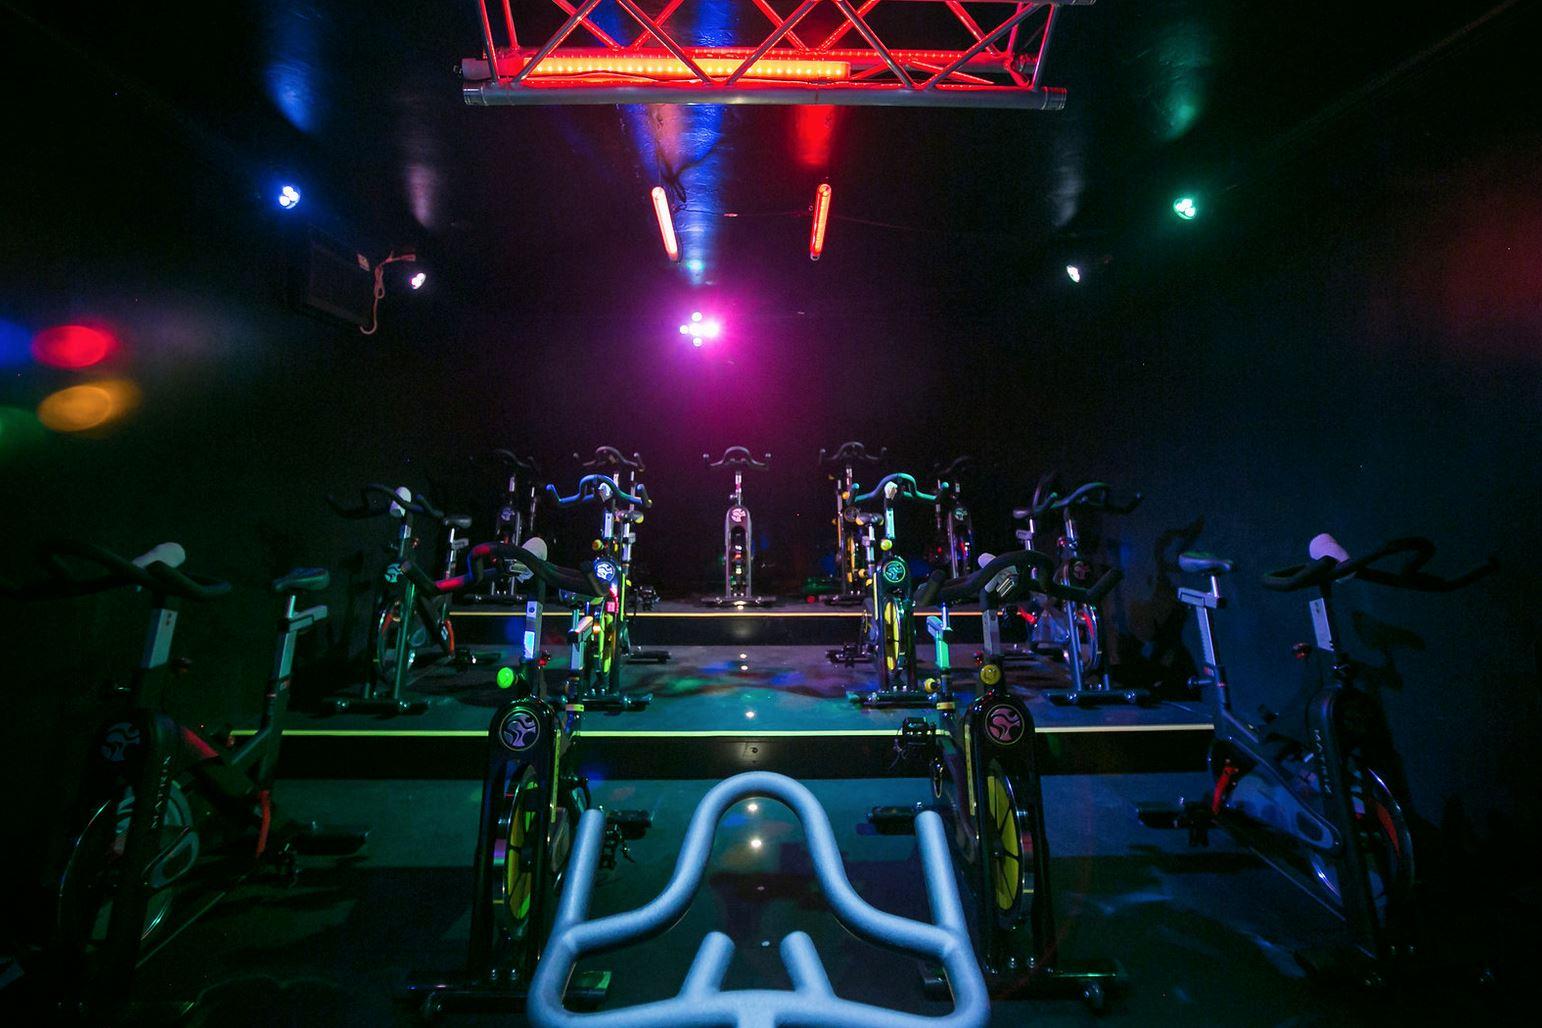 mad fitness spin studio